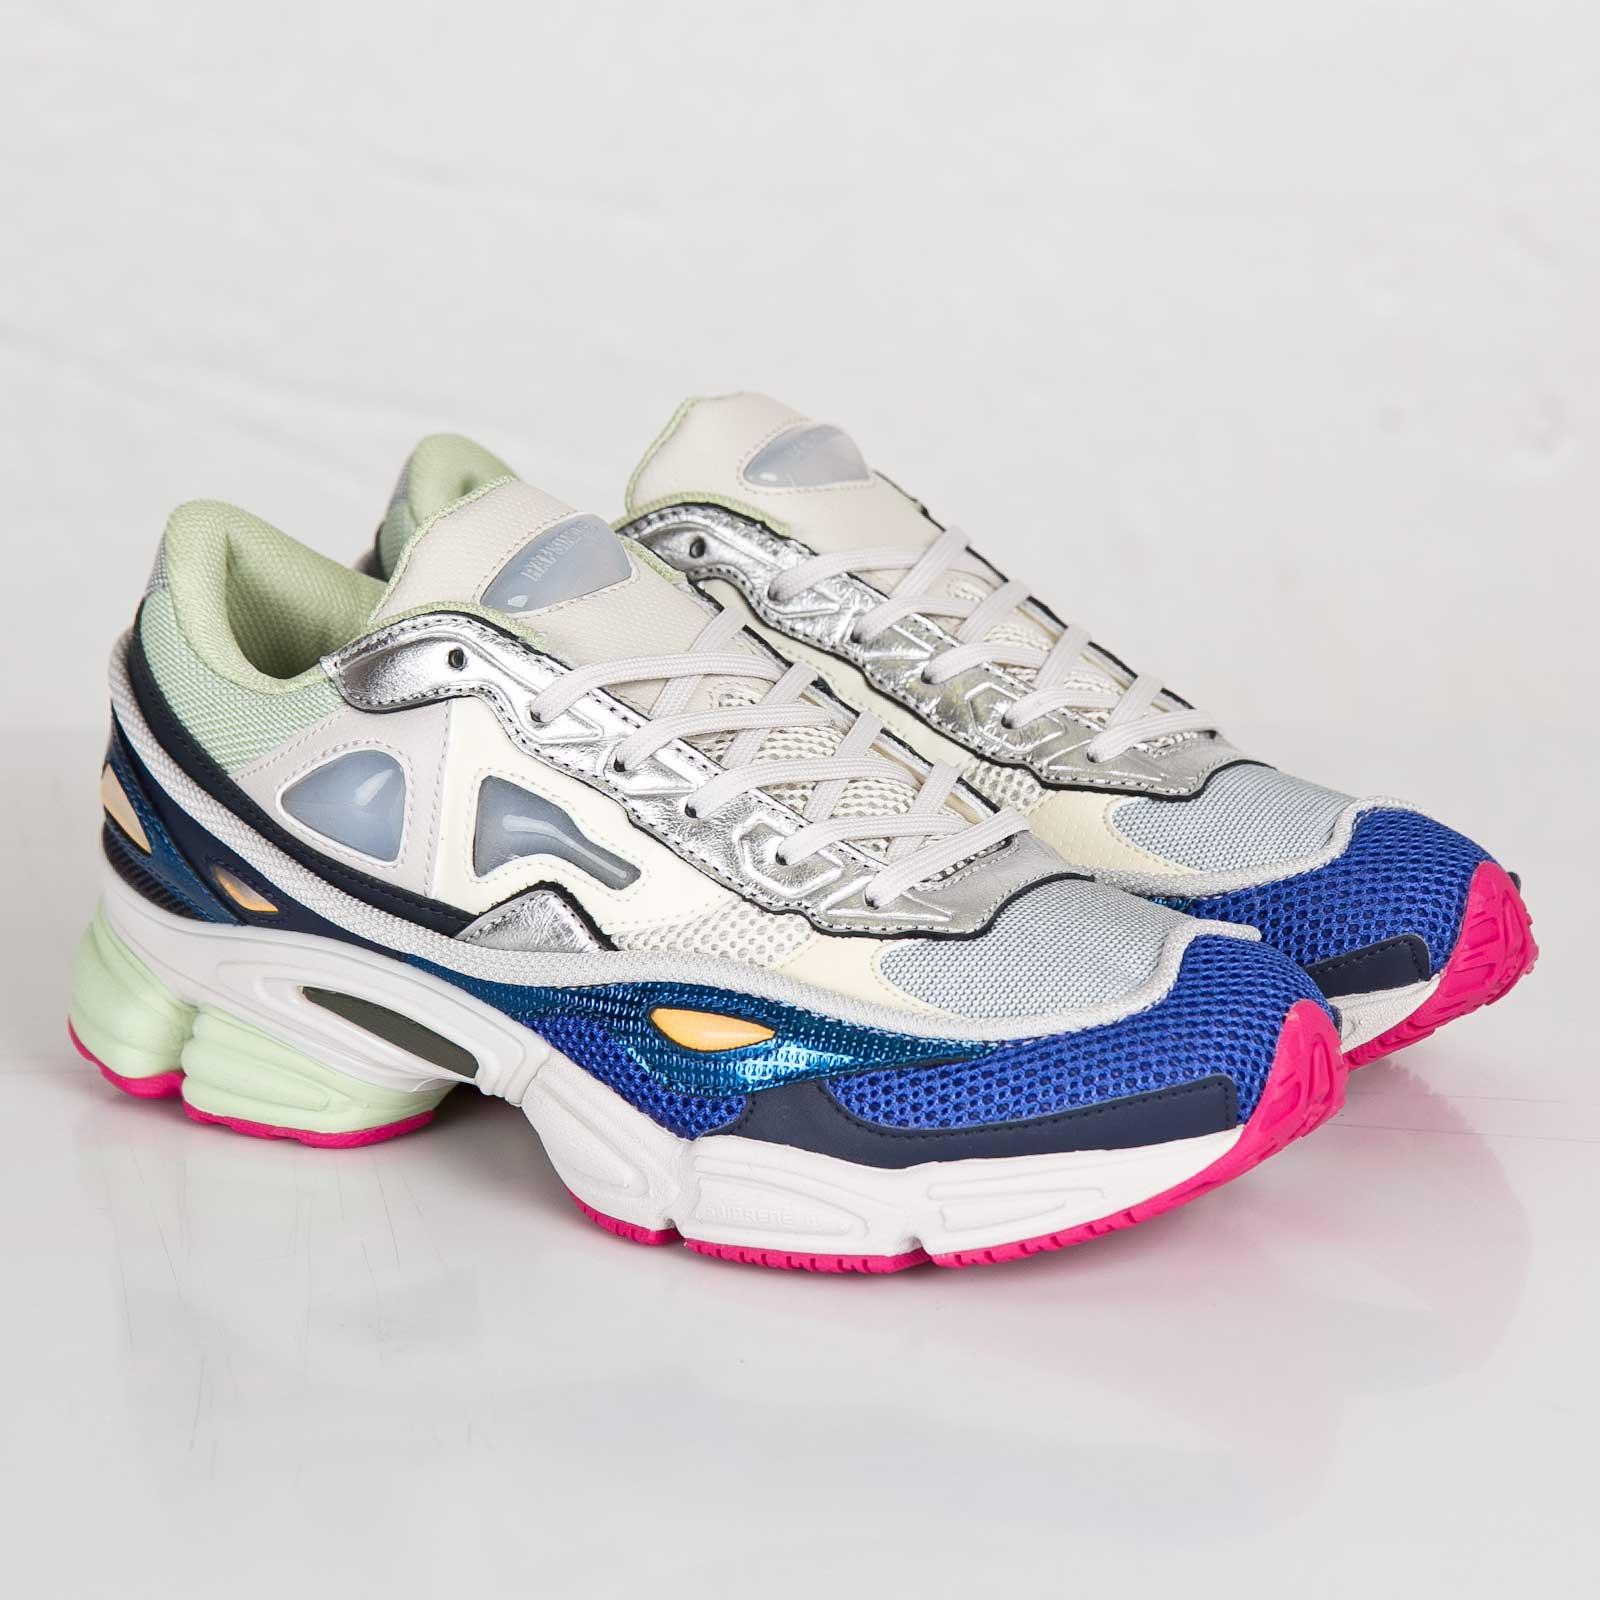 promo code 93a88 ea6b5 adidas Raf Simons Ozweego 2 - B26077 - Sneakersnstuff ...